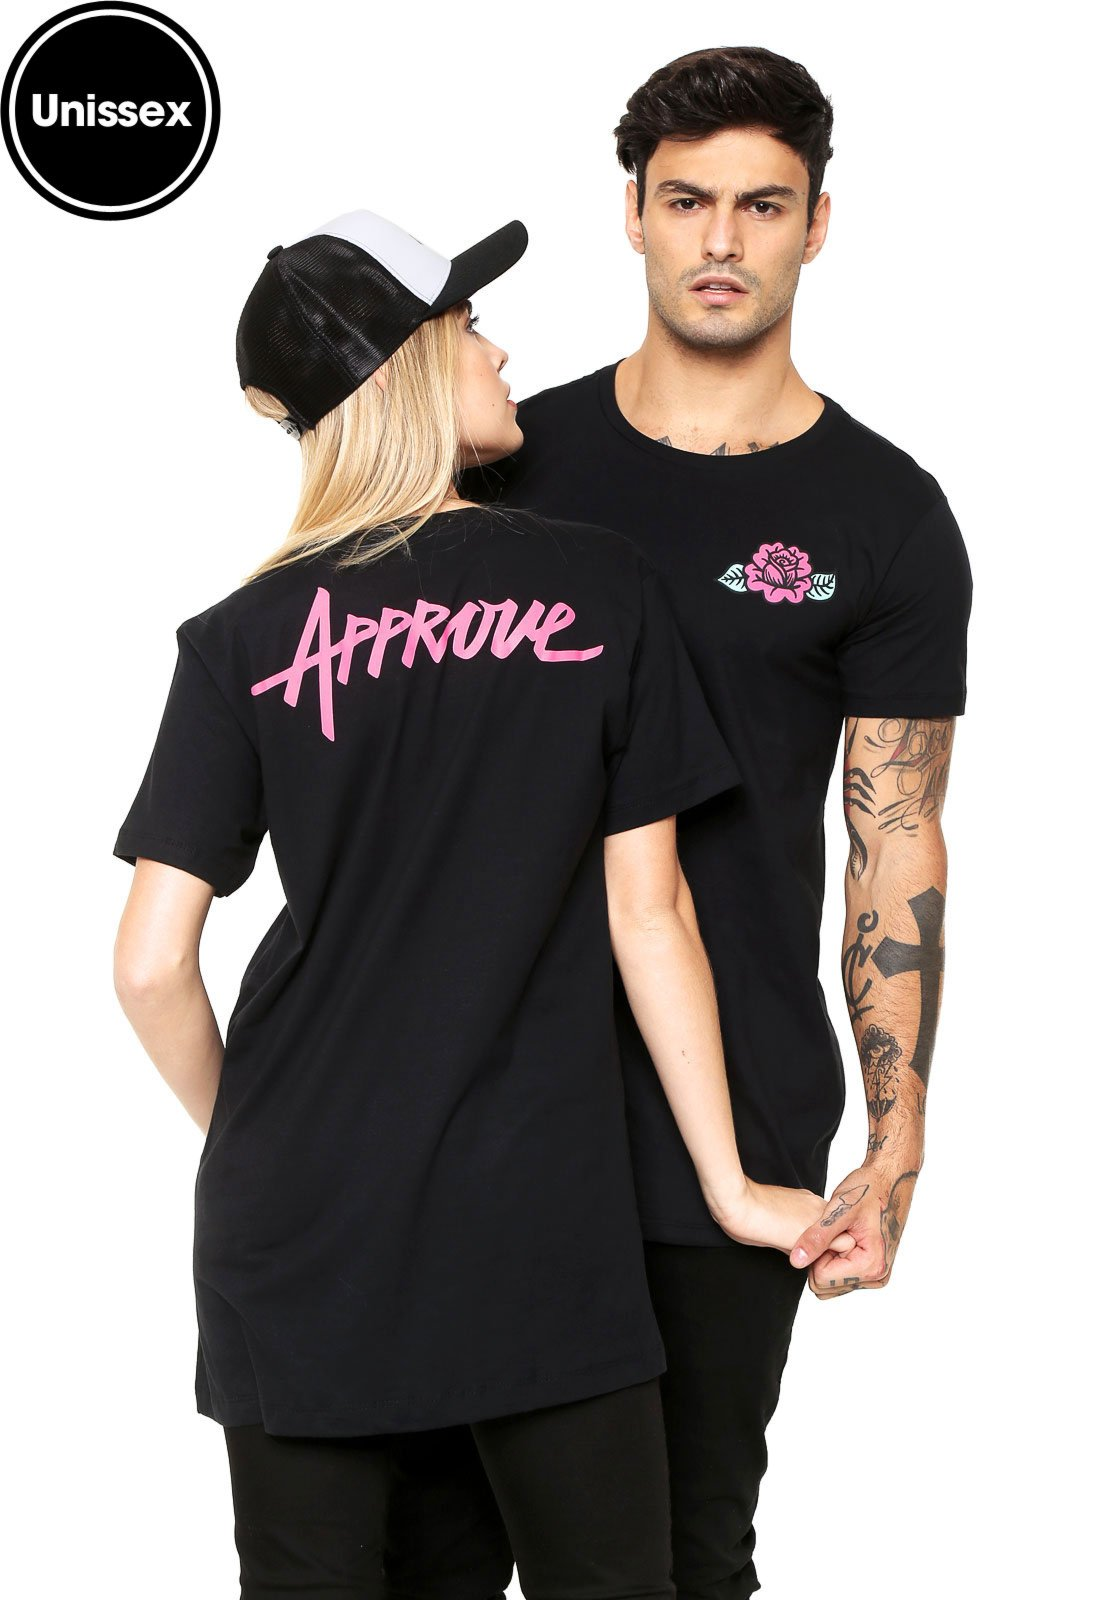 496c2ec16 Camiseta Unissex Blind Love Manga Curta Rose Long Fit Preta - Compre Agora  | Kanui Brasil